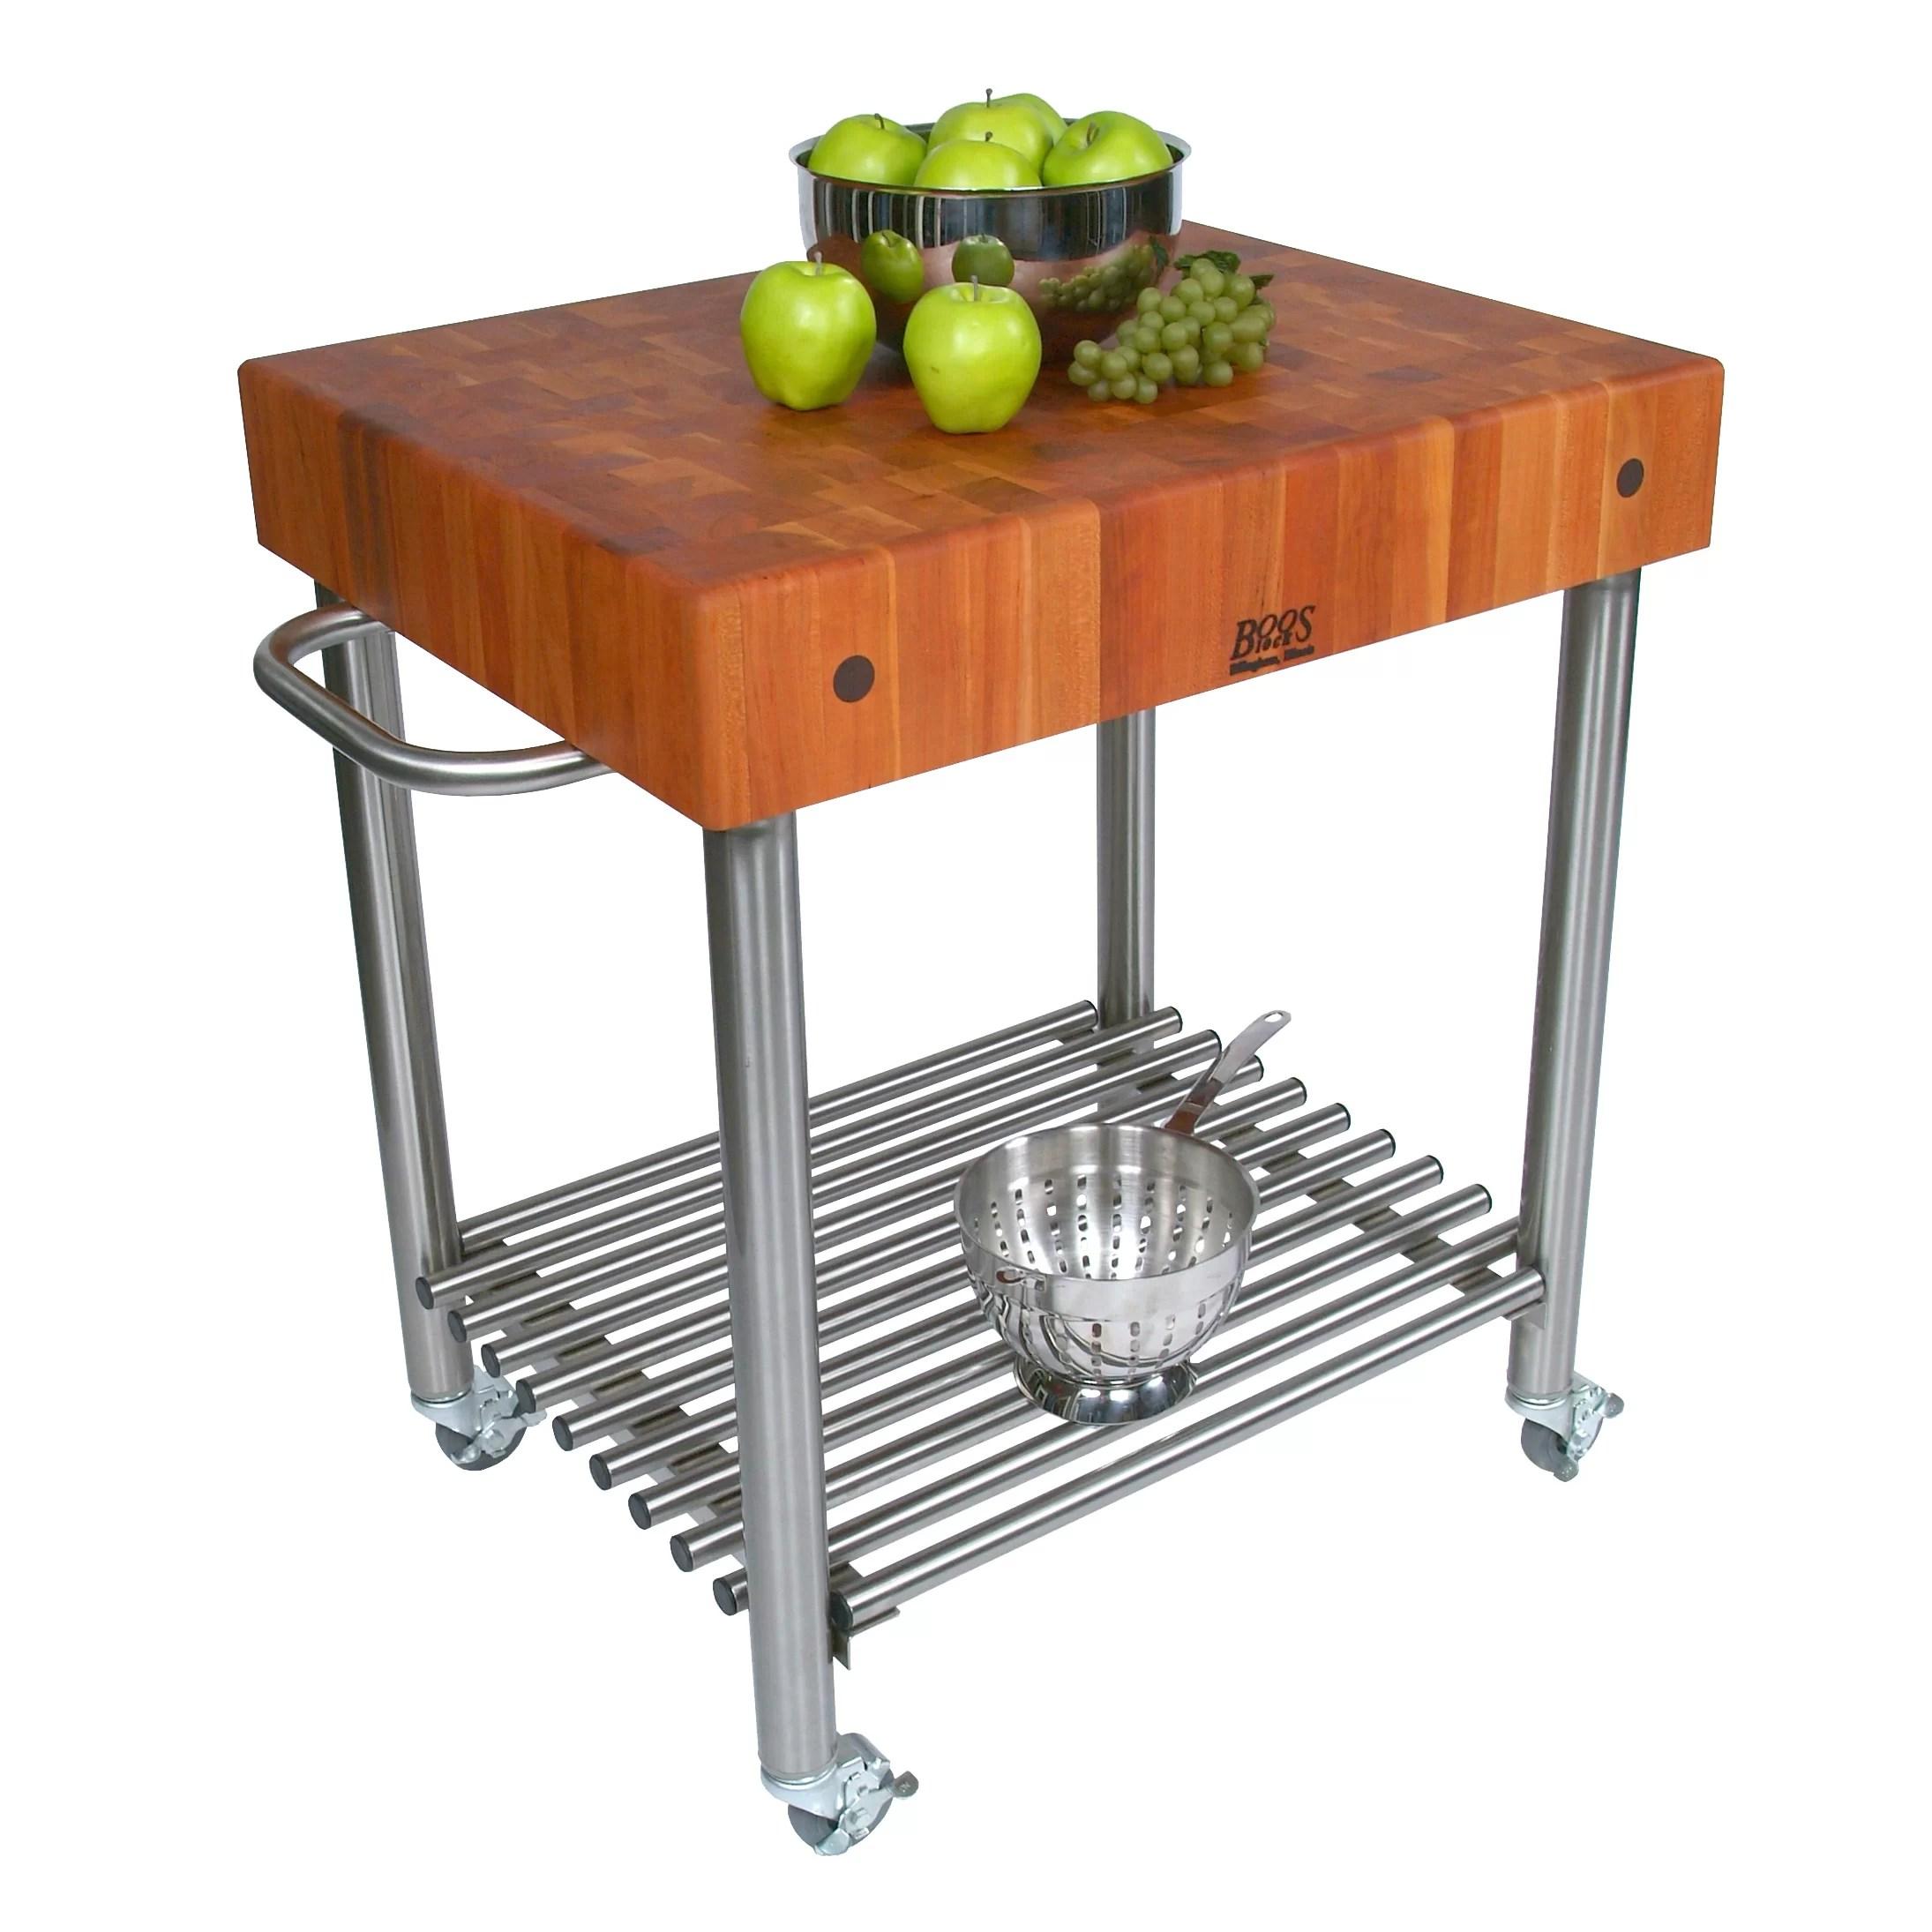 john boos kitchen islands farm tables cucina americana cart with butcher block